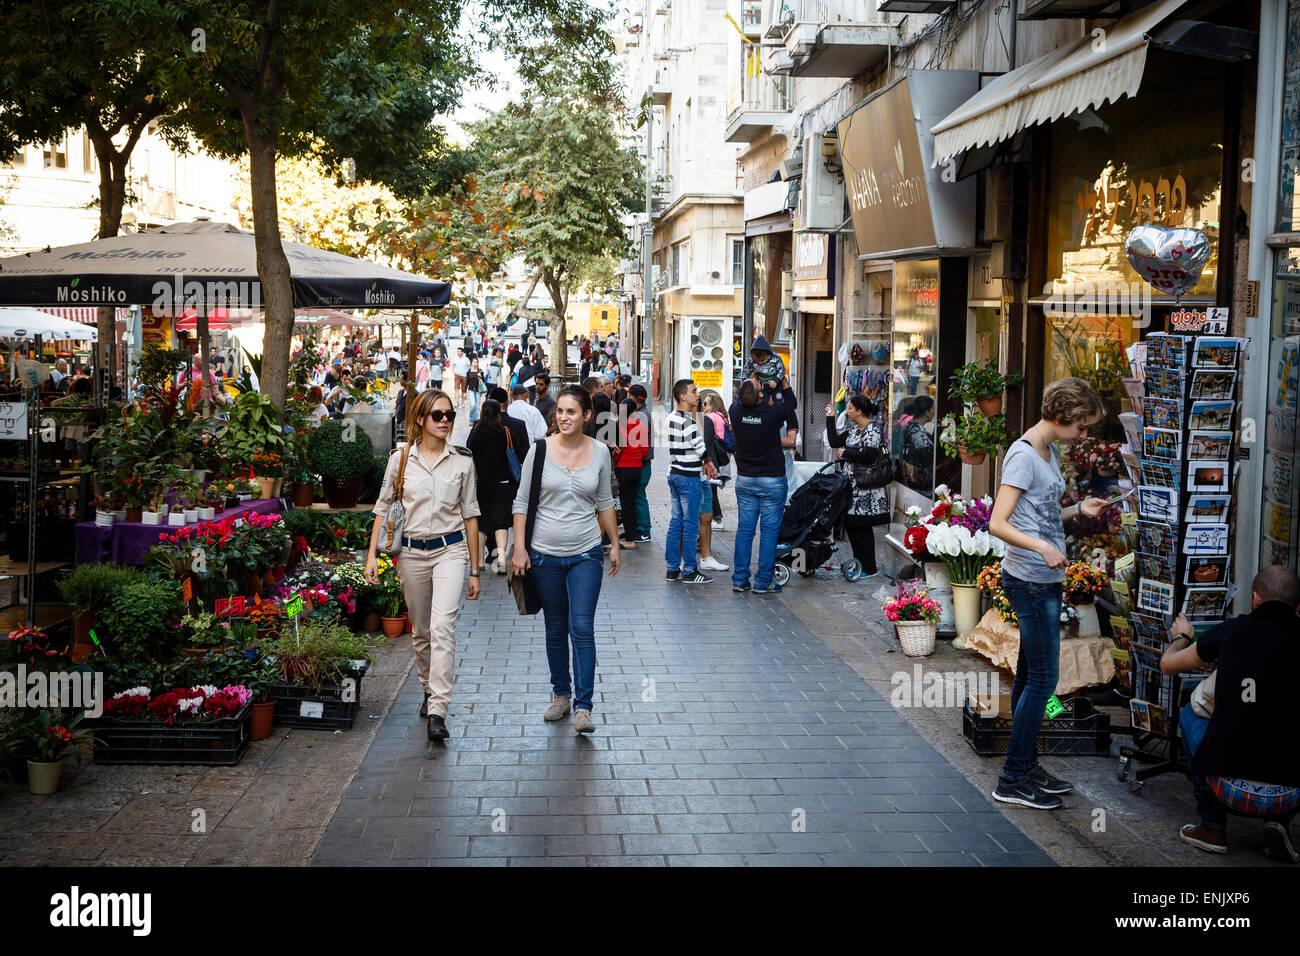 Ben Yehuda Pedestrian Street Jerusalem Israel Middle East Stock Photo Alamy